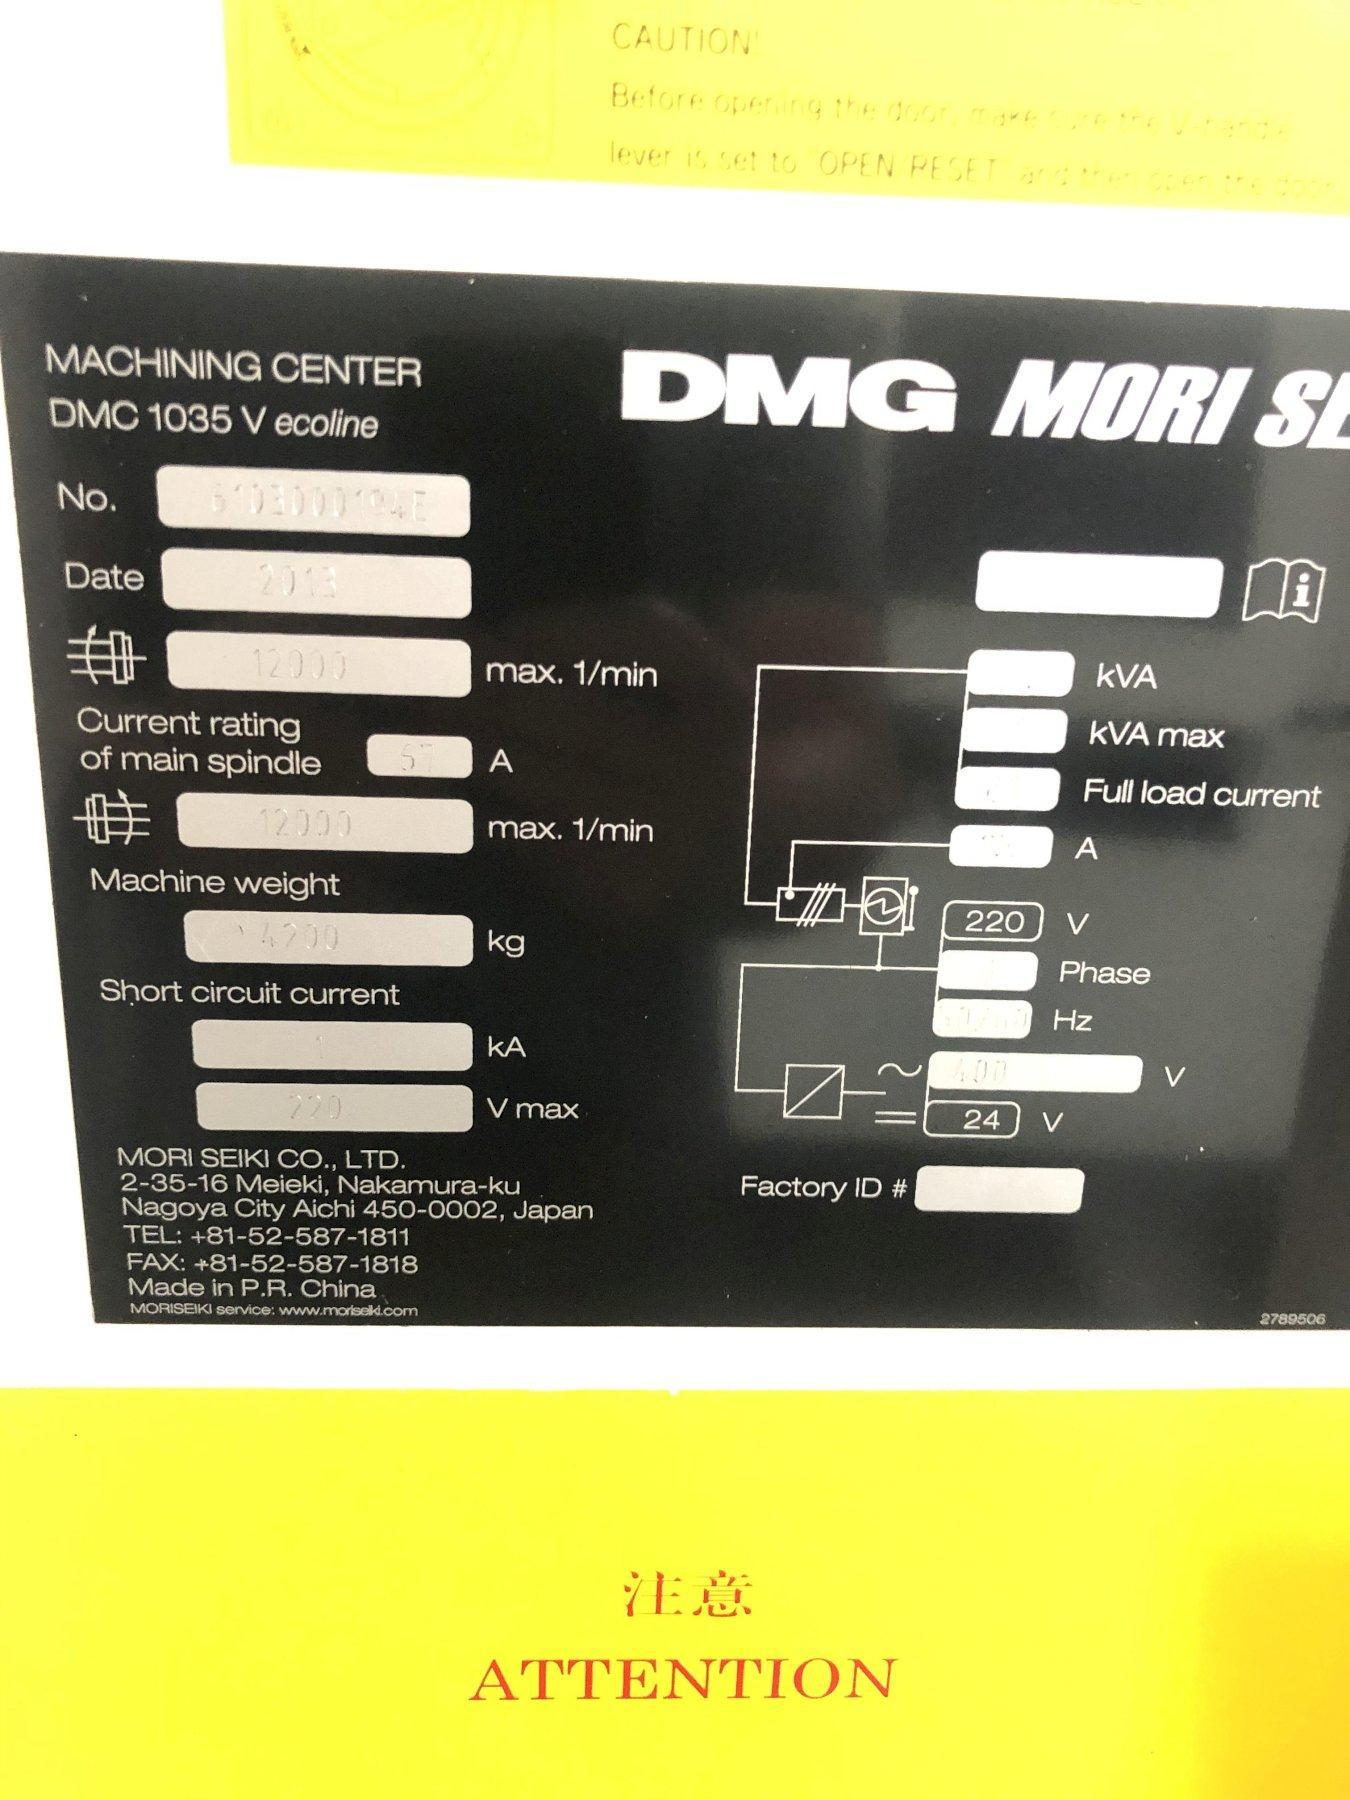 Mori Seiki DMC 1035 Eco VMC 2013 with Mori Mapps Control, 12,000 RPM Spindle, and Jorgensen Chip Conveyor.